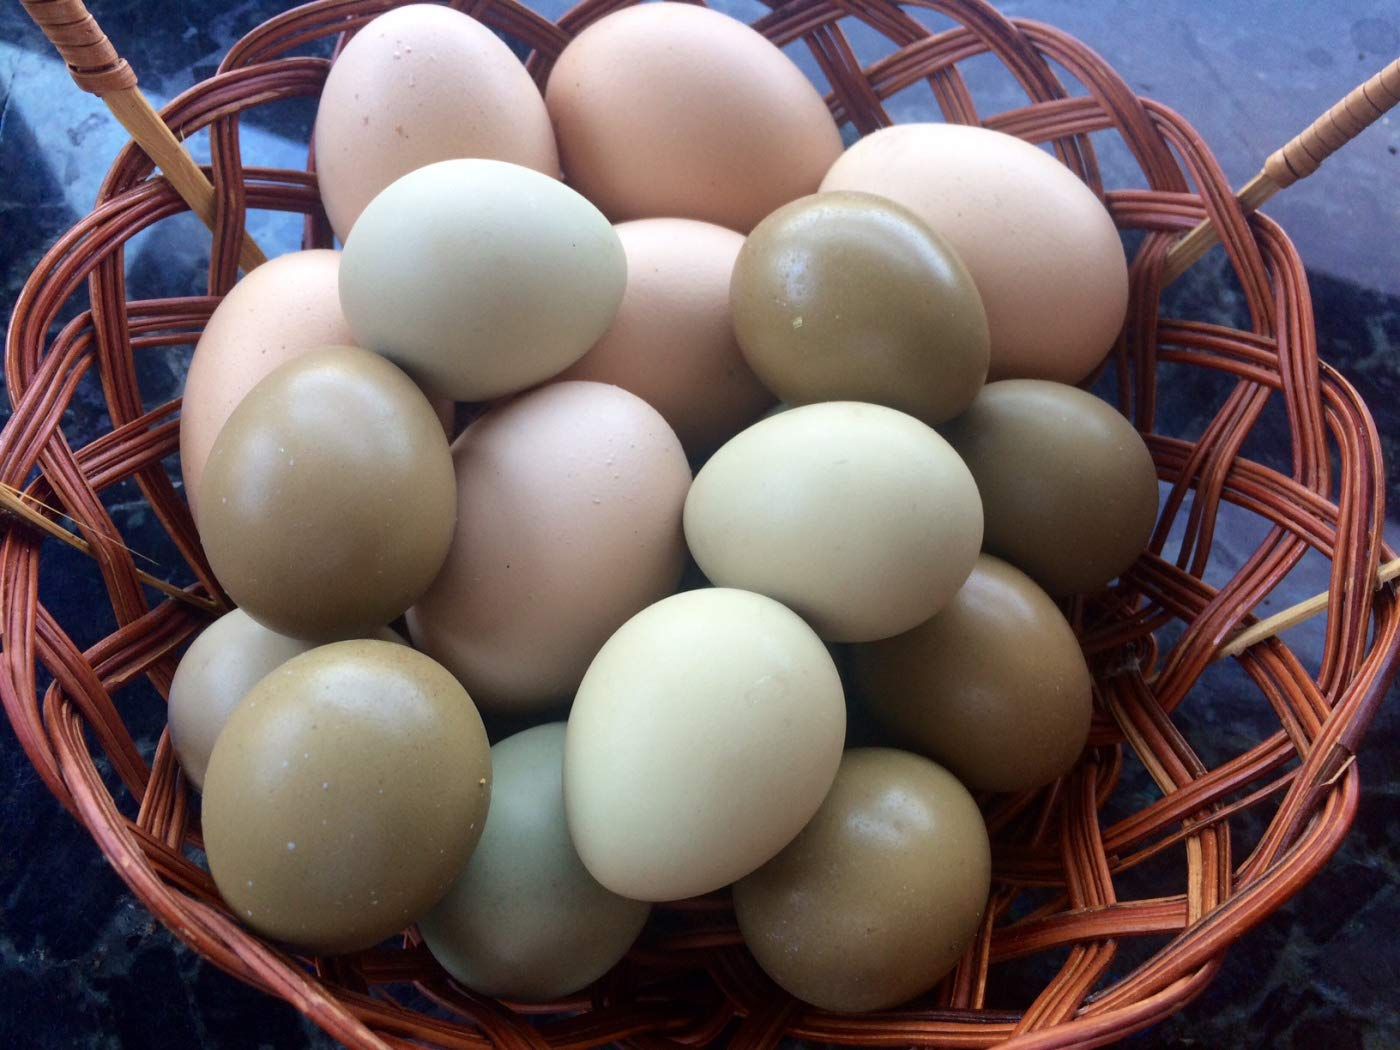 MacFarlane Fresh Pheasant Eggs